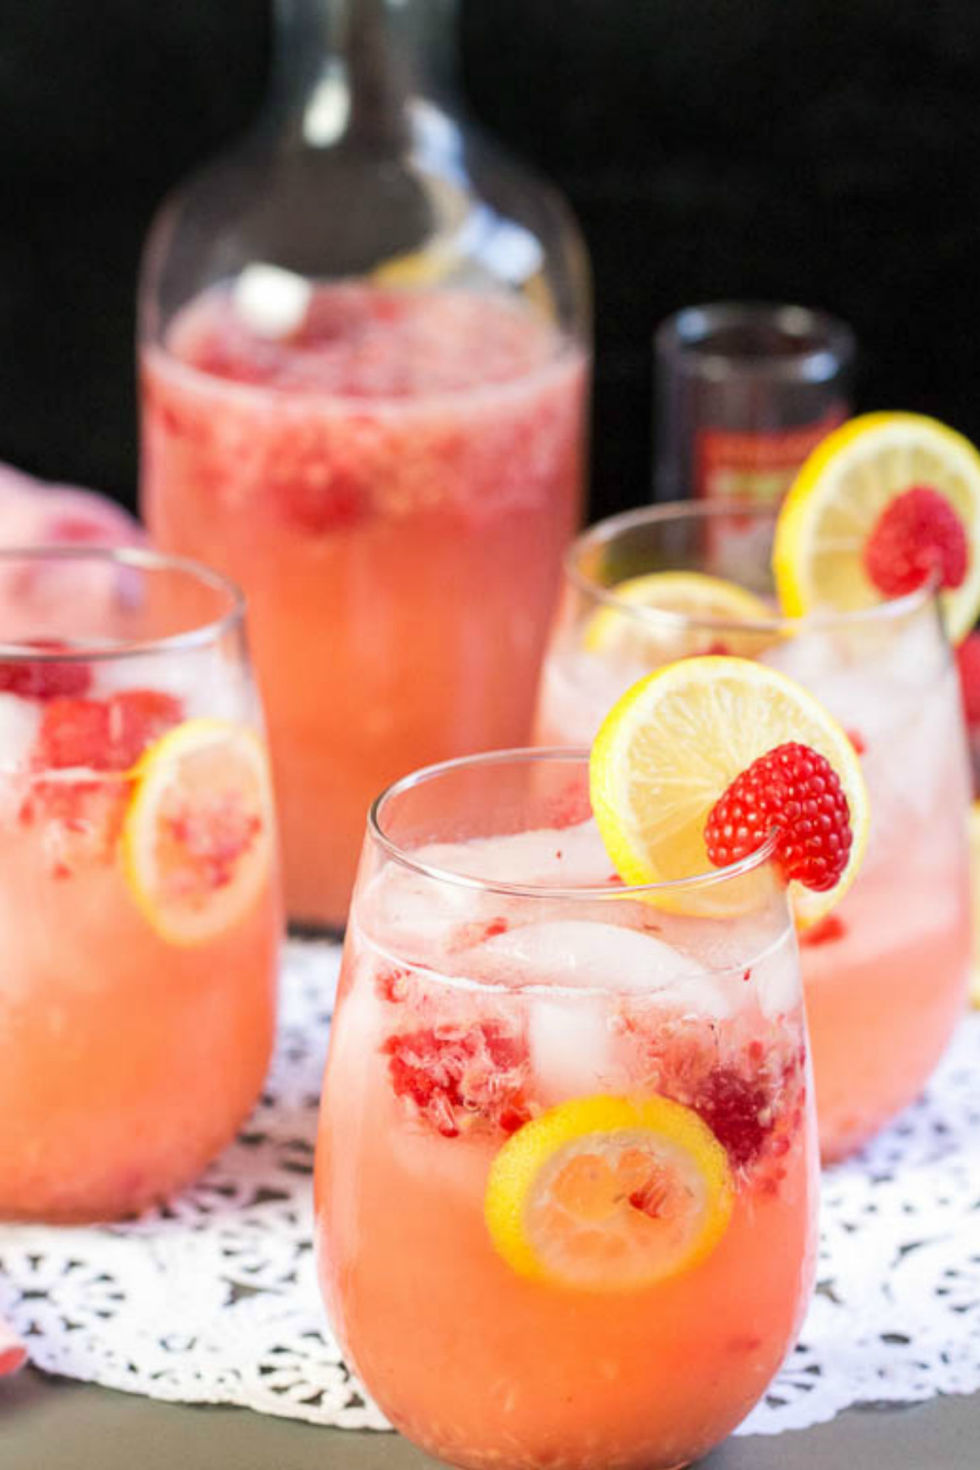 16 valentines day drinks best recipes for valentines day cocktails - Valentine Drink